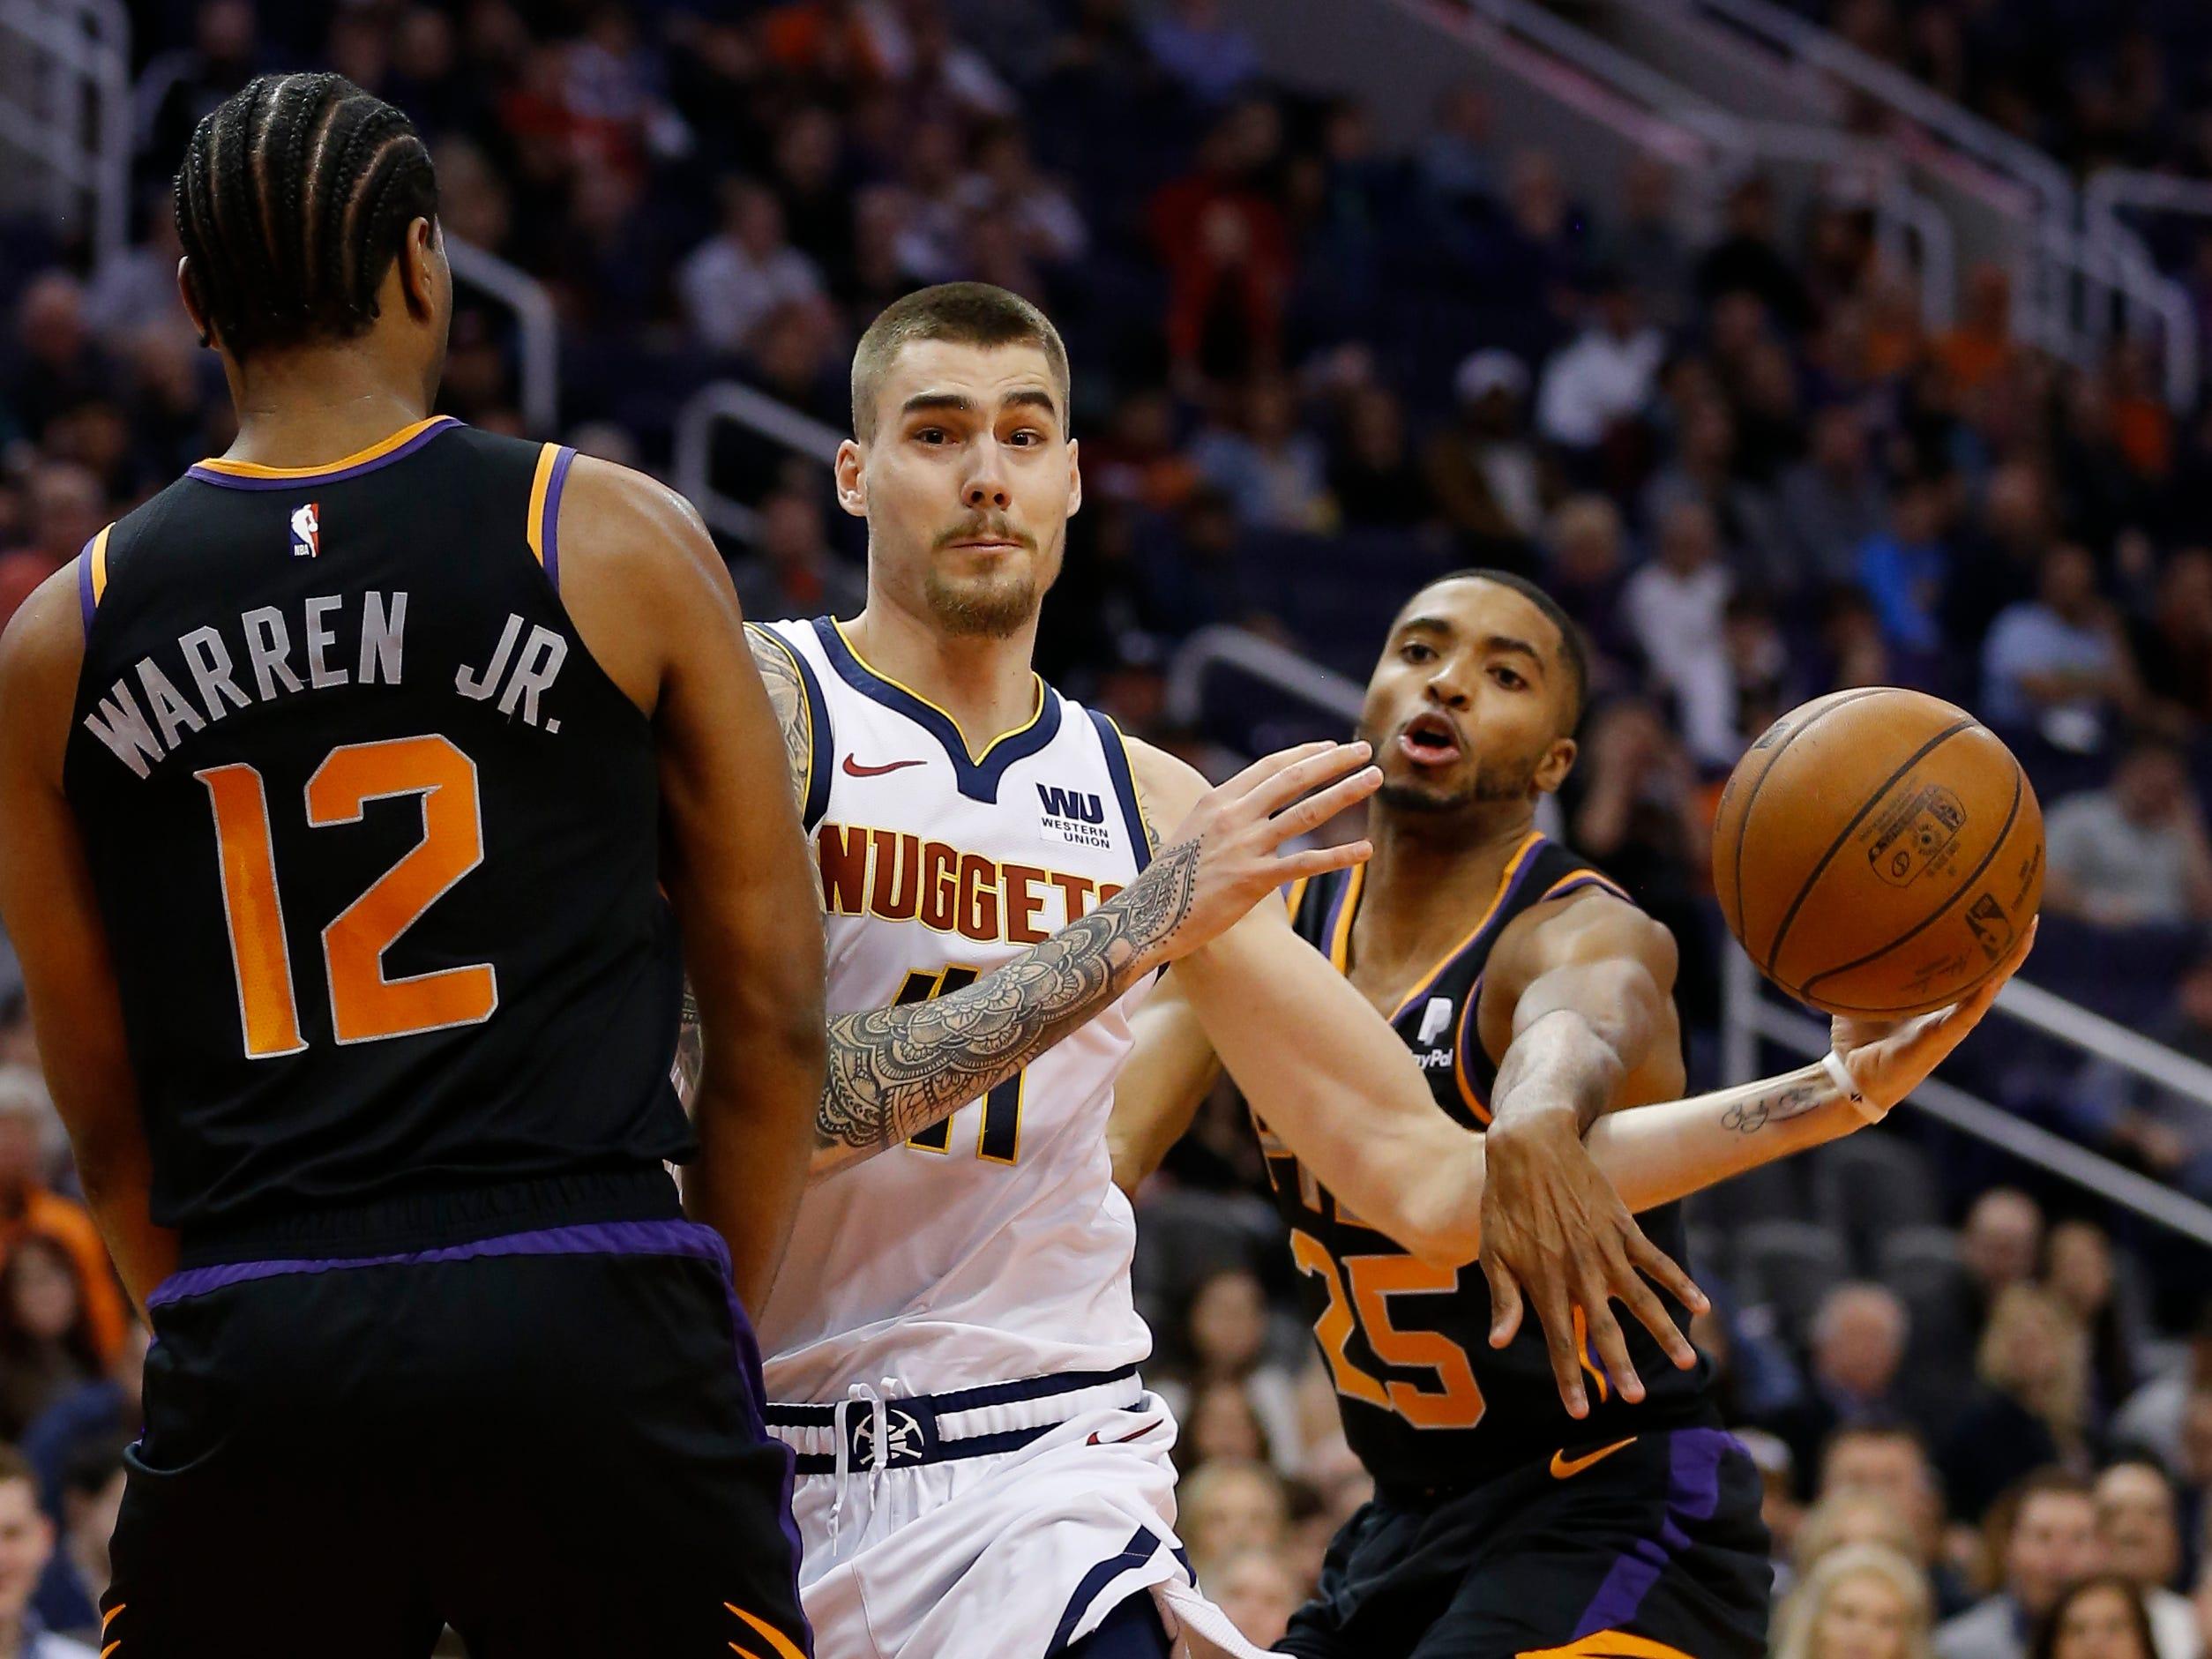 Denver Nuggets forward Juan Hernangomez (41) gets fouled while driving between Phoenix Suns forward T.J. Warren (12) and Mikal Bridges (25), Saturday, Jan. 12, 2019, in Phoenix. (AP Photo/Rick Scuteri)